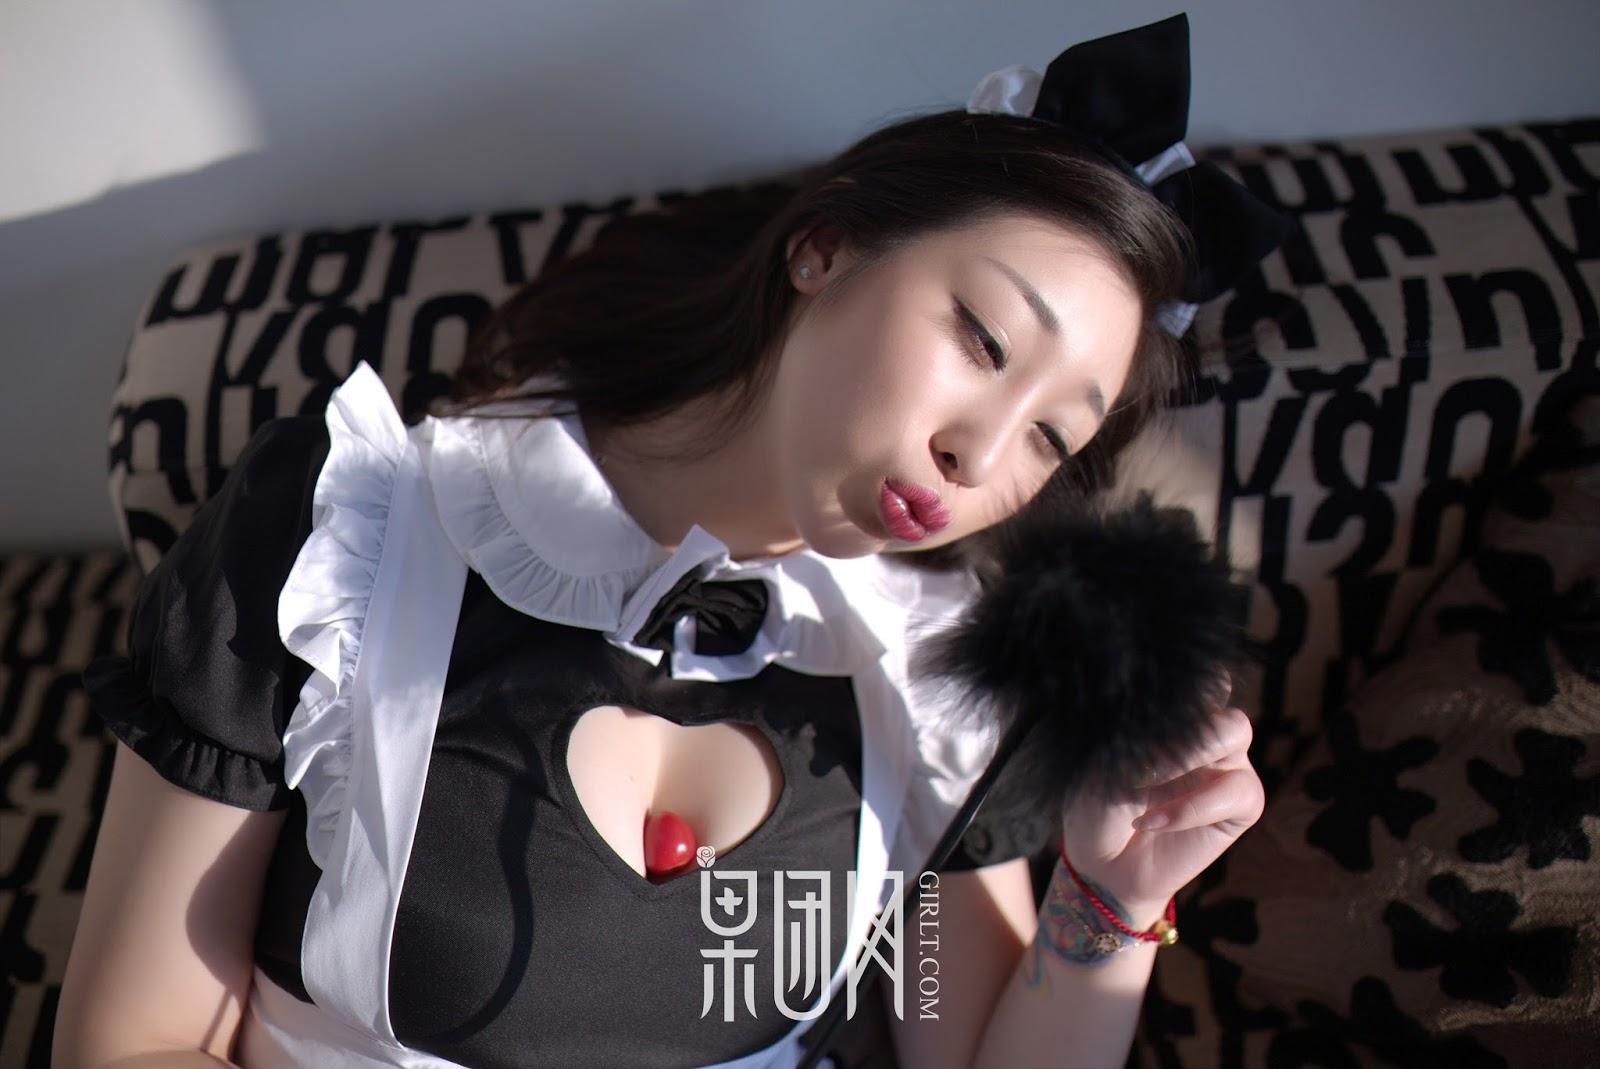 GIRLT - No.079 Daji_Toxic (43 pics) - Page 2 of 2 - Asian